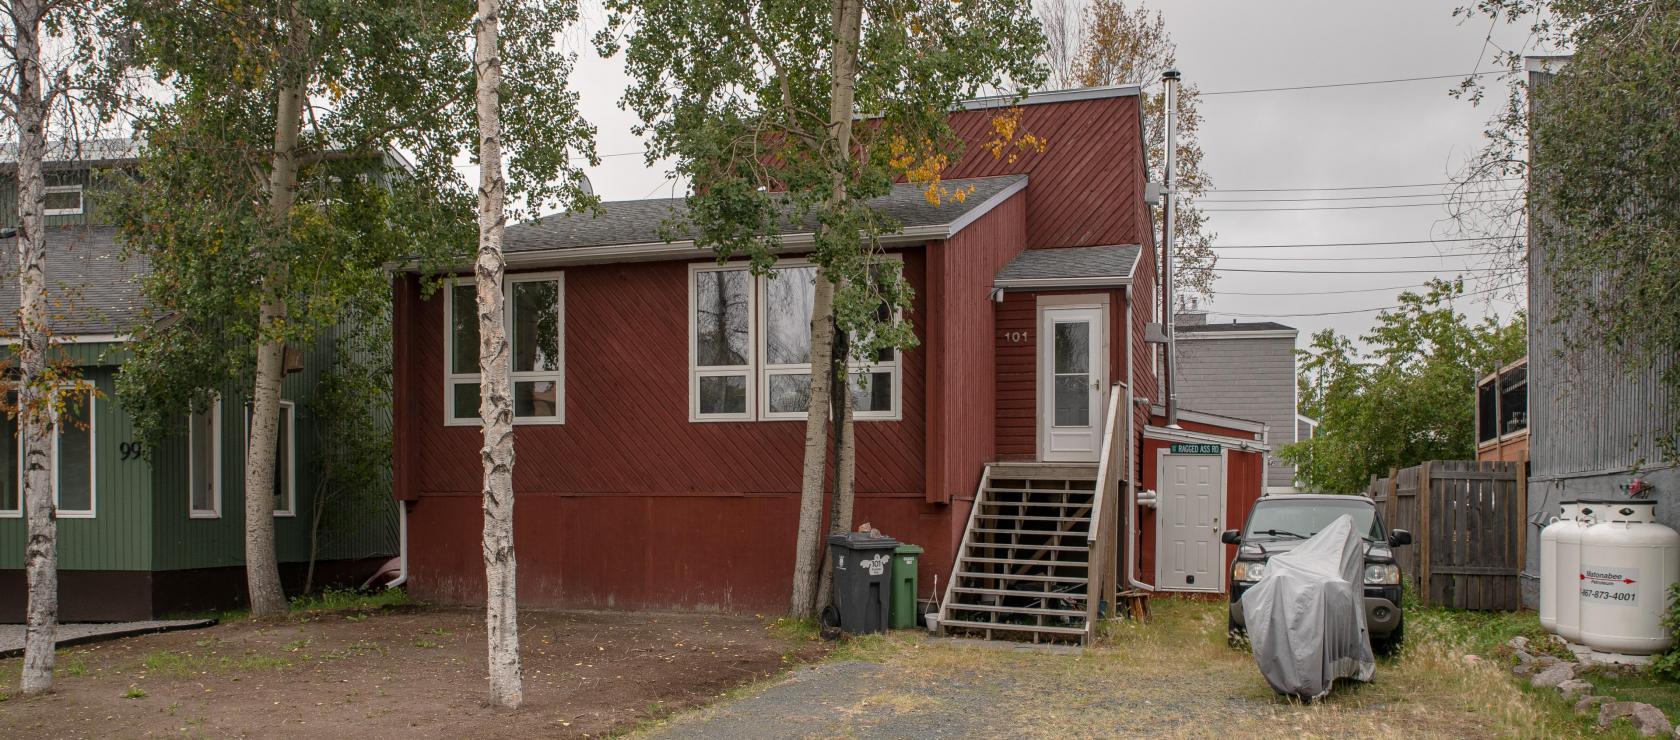 101 Knutsen Avenue, Range Lake, Yellowknife 2